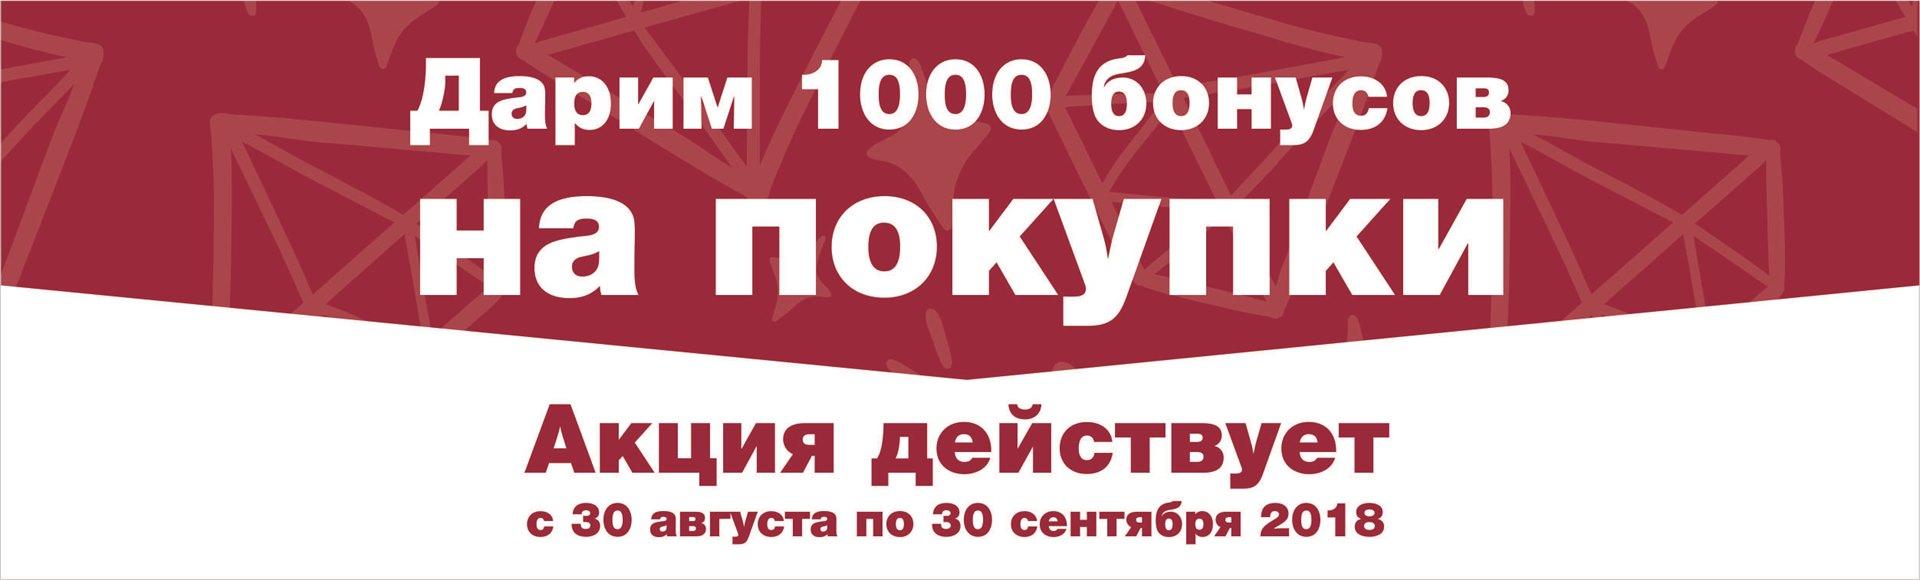 https://www.almazcom.ru/pub/img/QA/actions/aktsii_na_sajt_1000_bonusov.jpg